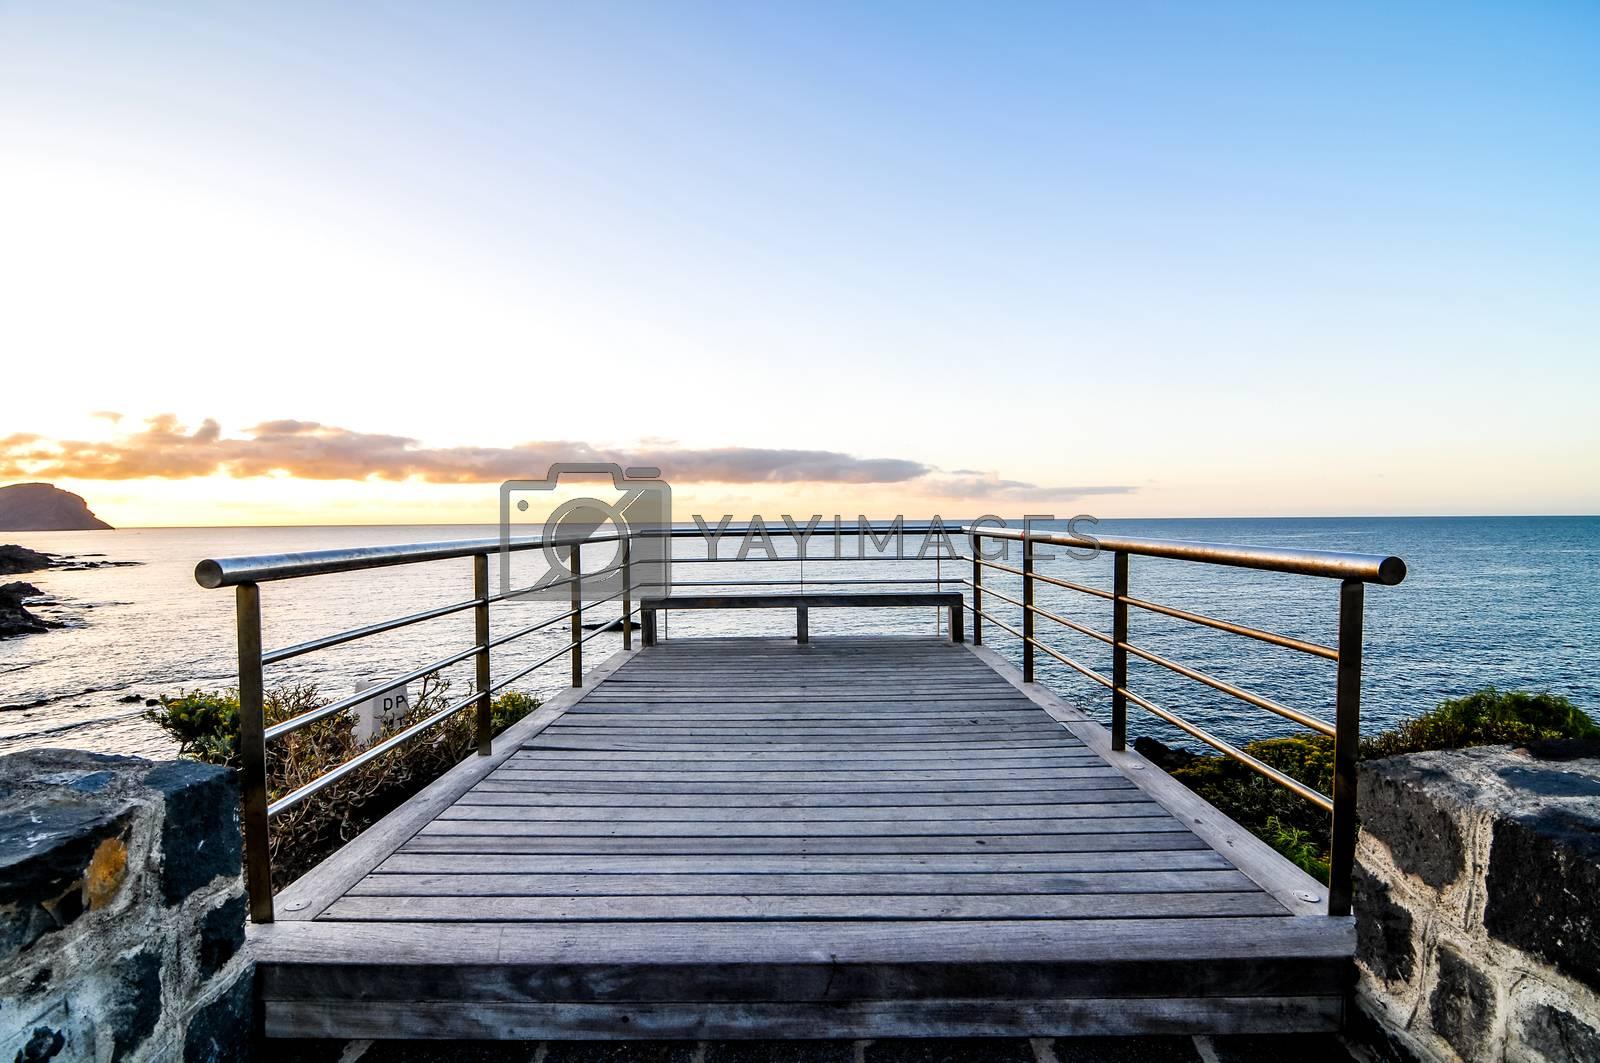 Royalty free image of Sunrise Pier by underworld